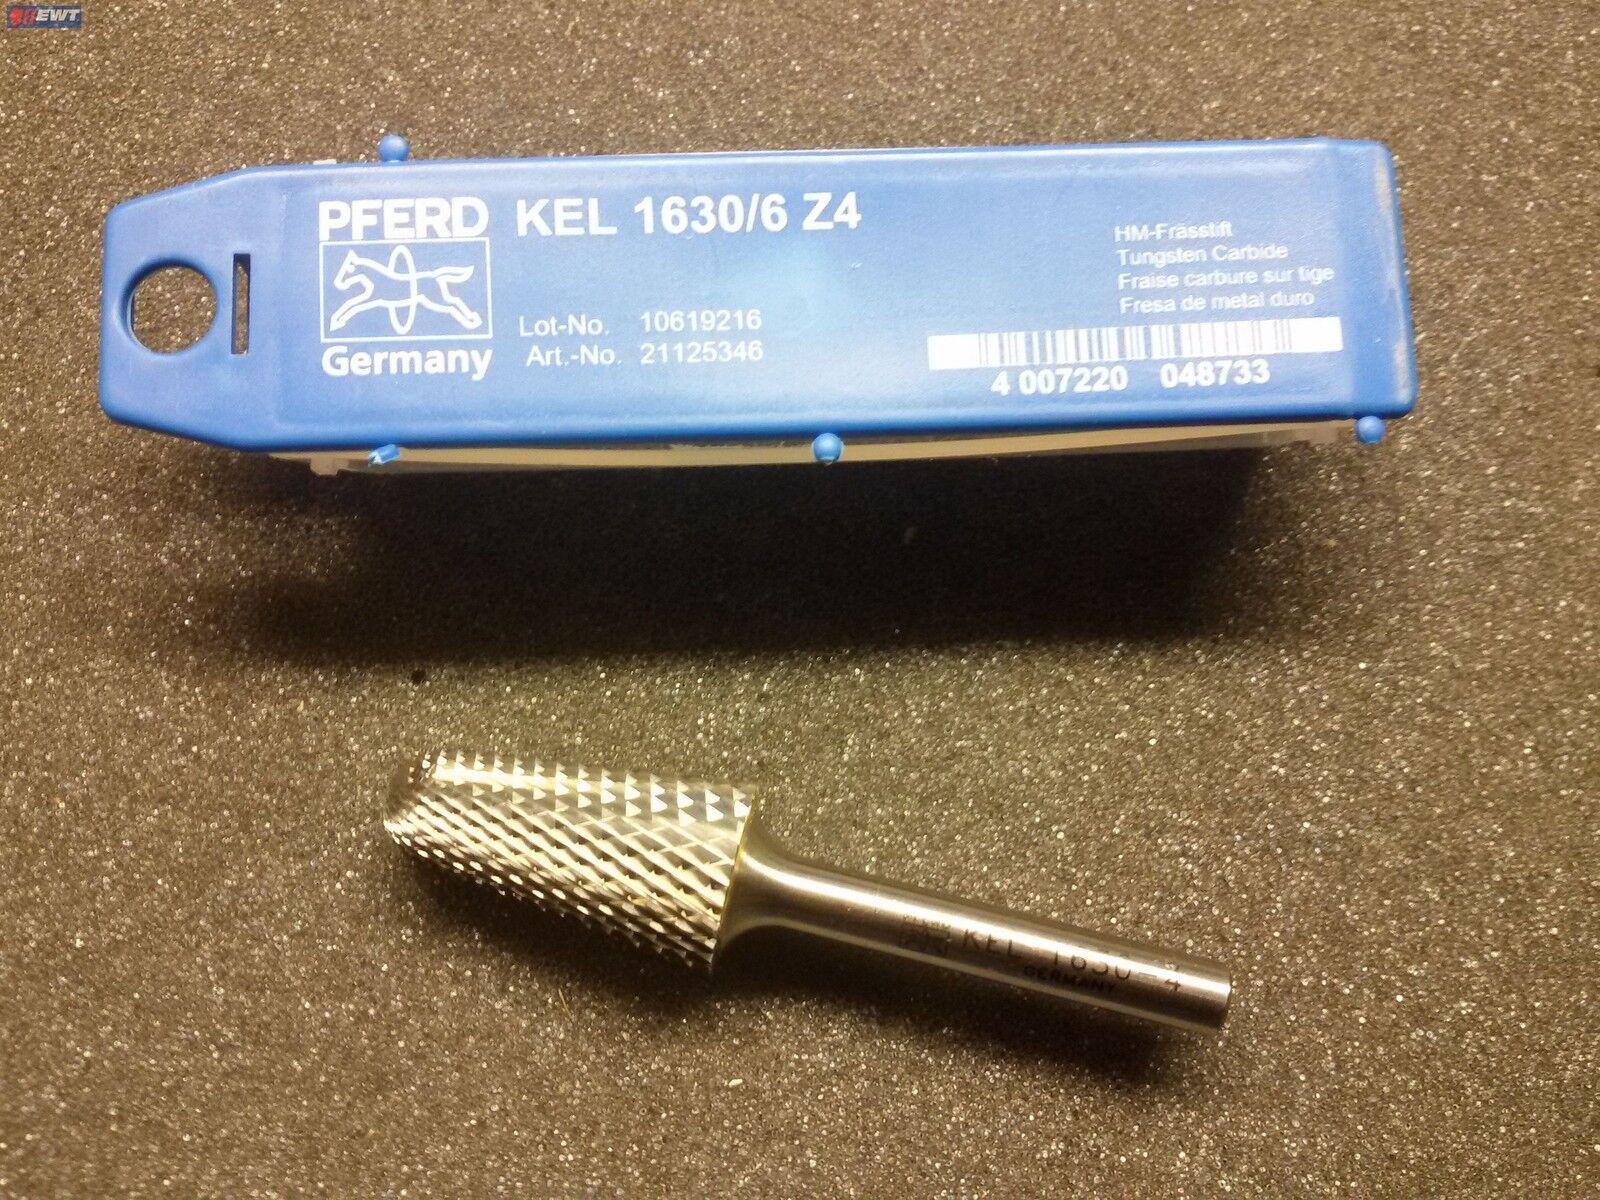 PFERD 21125346 KEL 1630/6 Z4 HM- Frässtift Rundkegelform